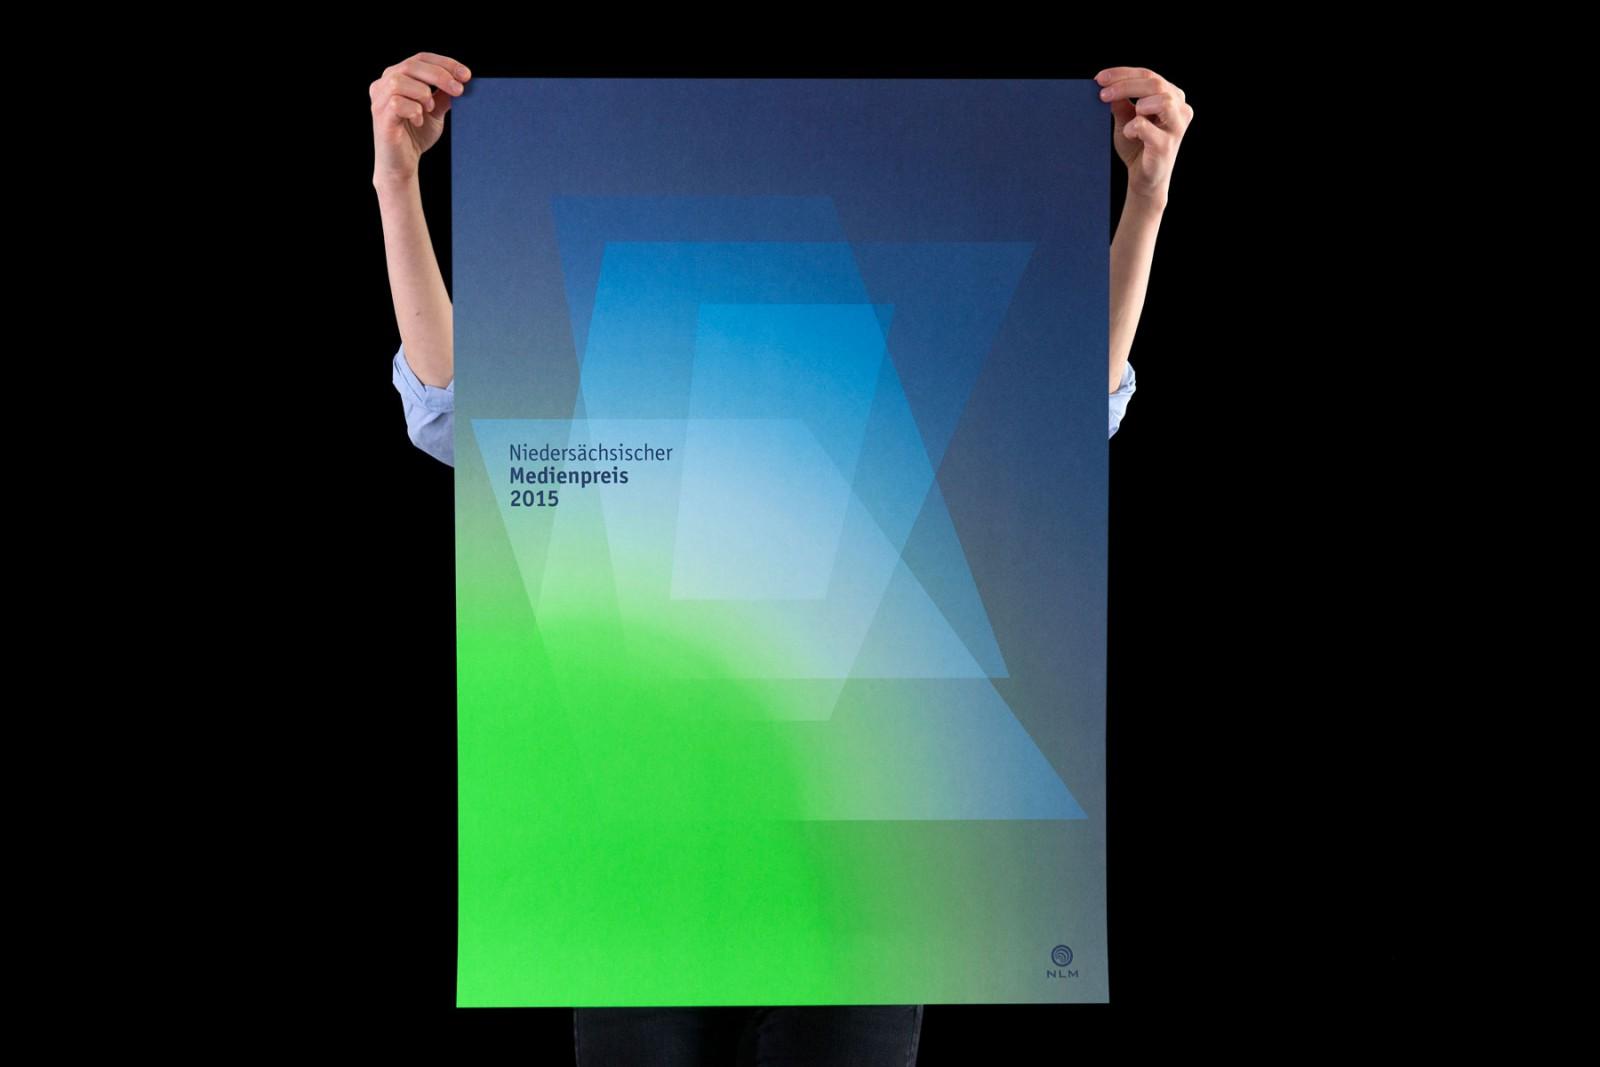 Niedersächsischer Medienpreis 2015 (Media Award of the State Media Authority of Lower Saxony)